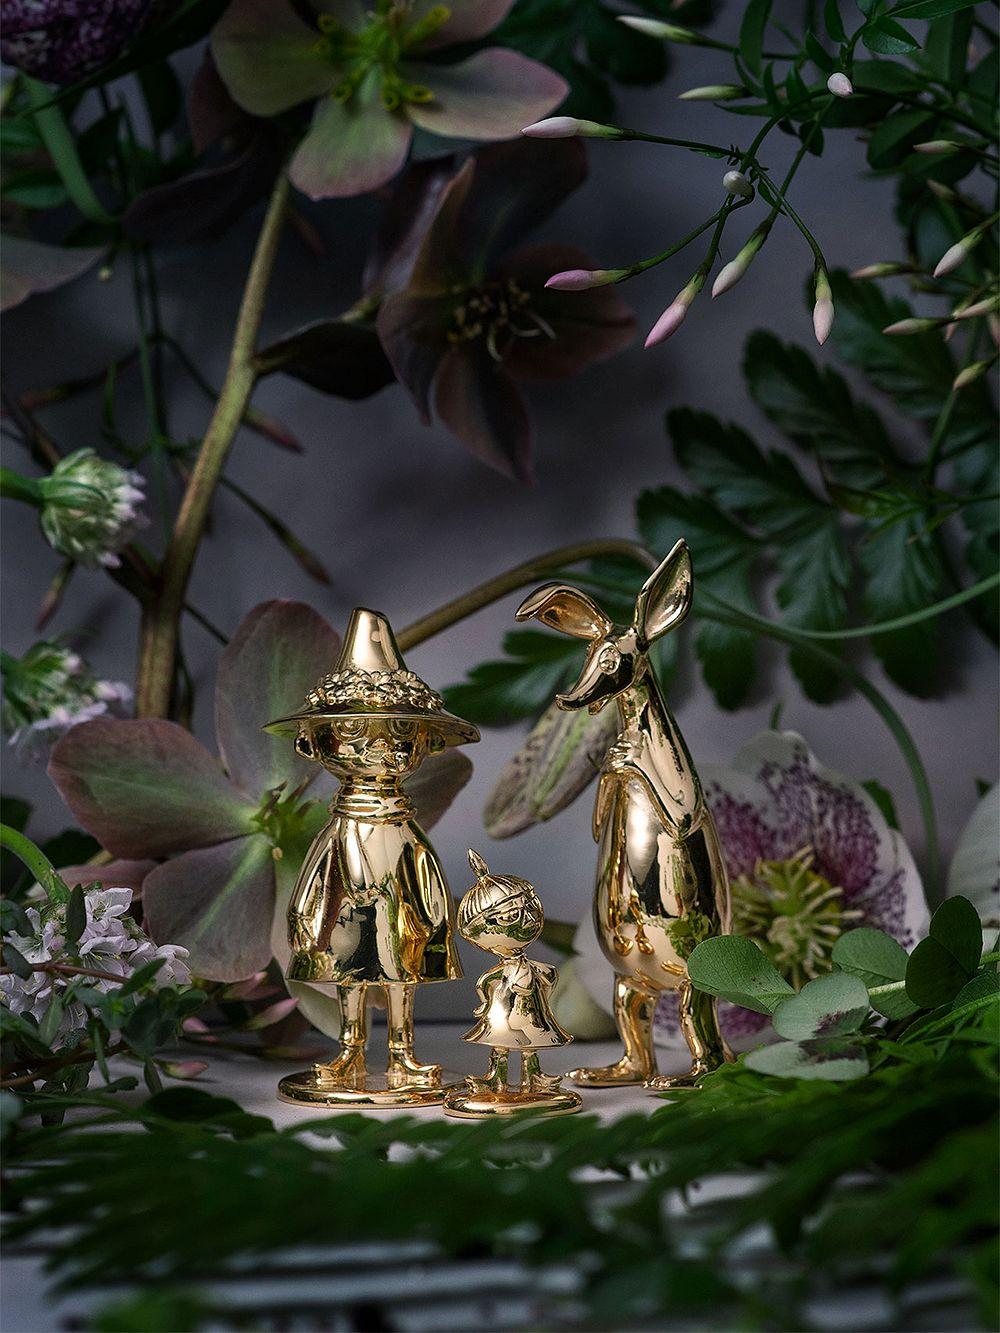 Moomin x Skultuna figurines